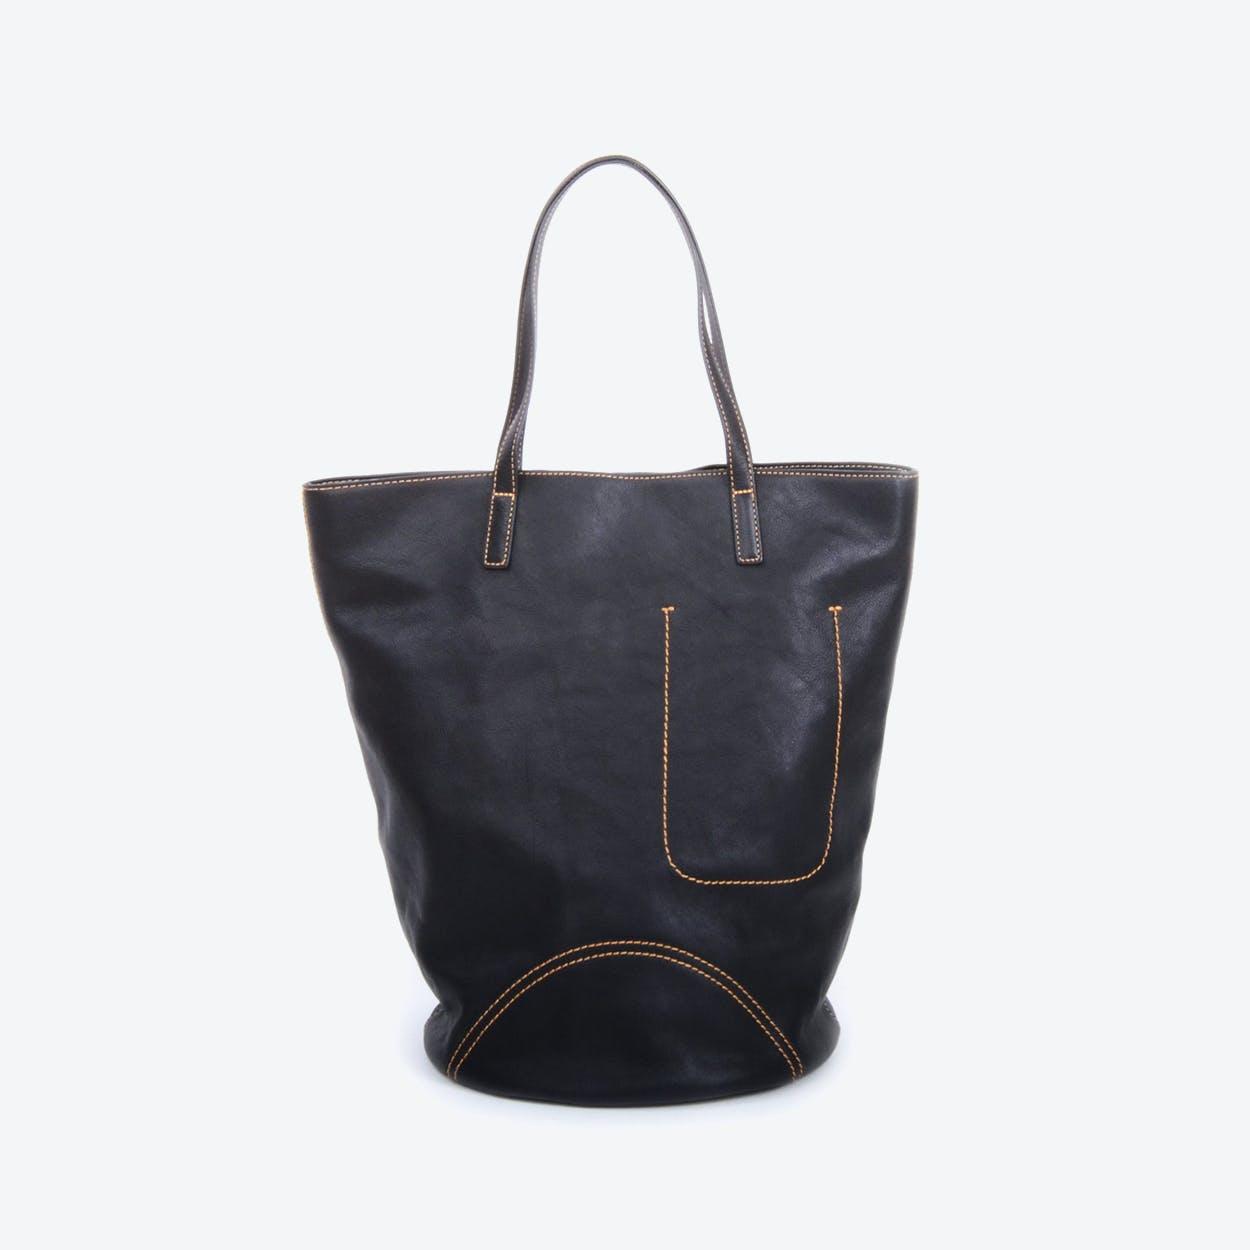 Womens Genuine Leather Tote Bag in Black